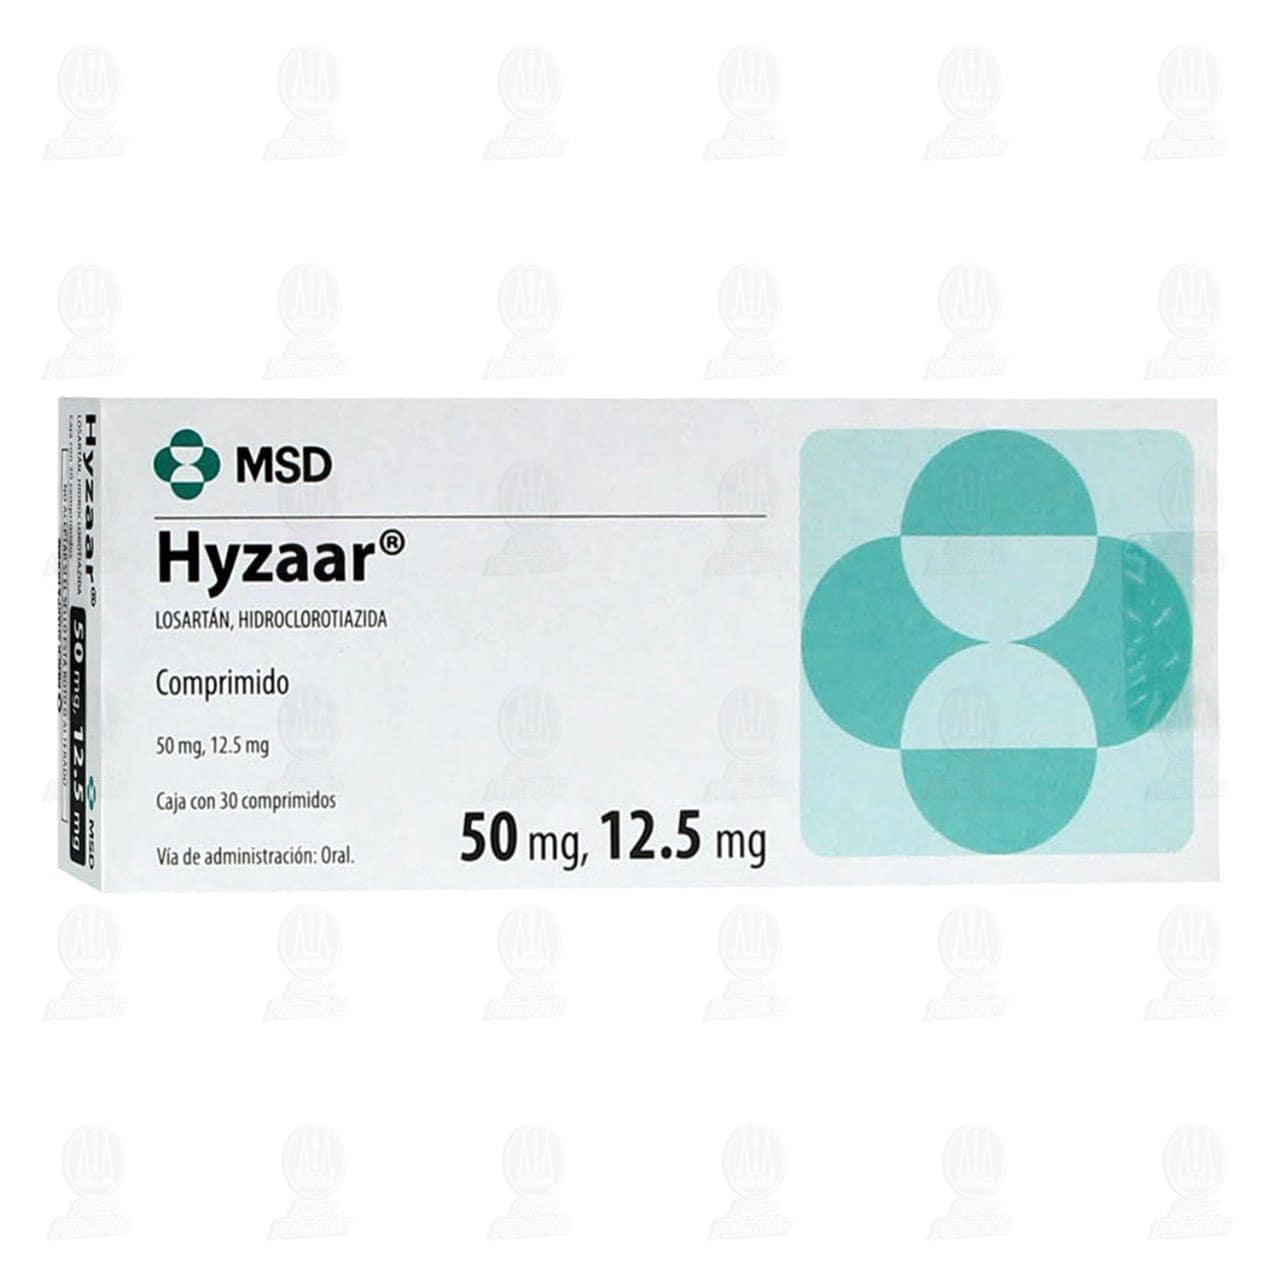 Hyzaar 50mg/12.5mg 30 Comprimidos